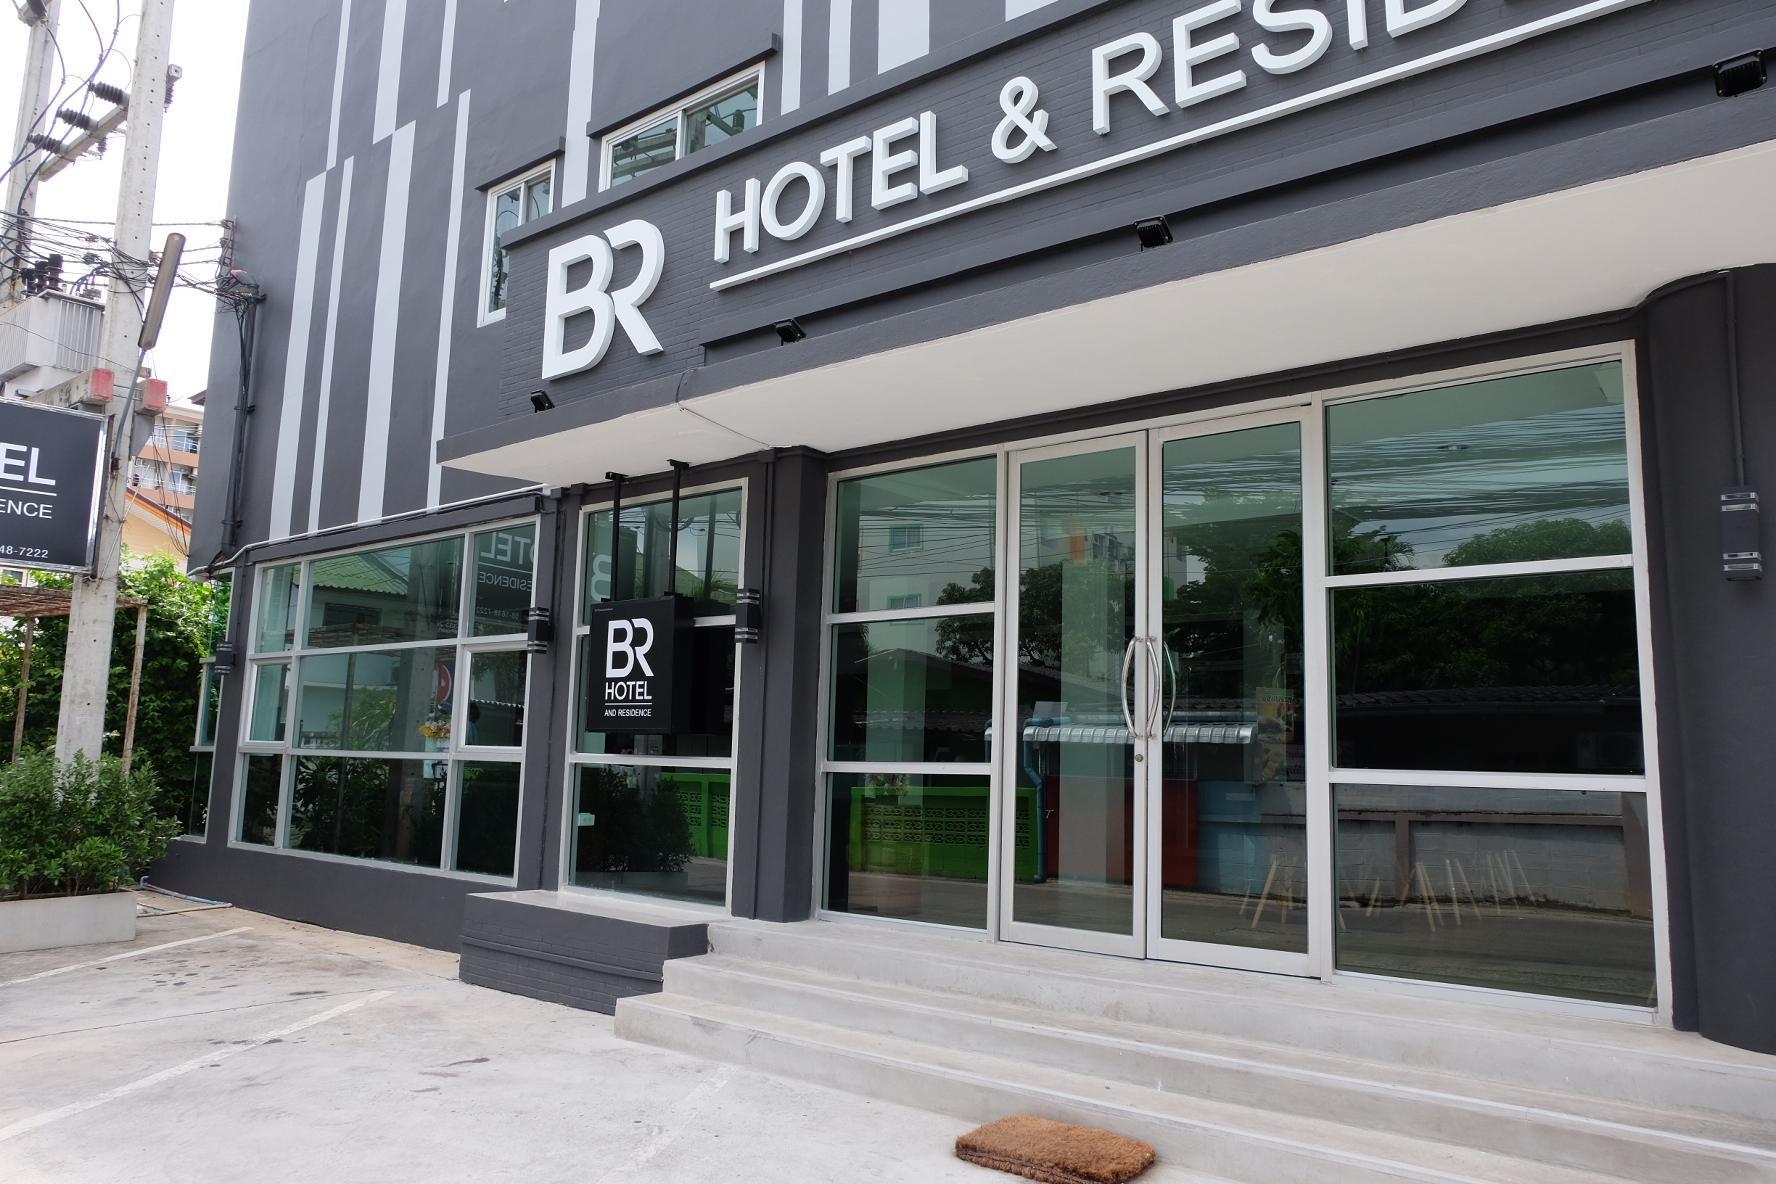 BR Hotel & Residence,BR Hotel & Residence